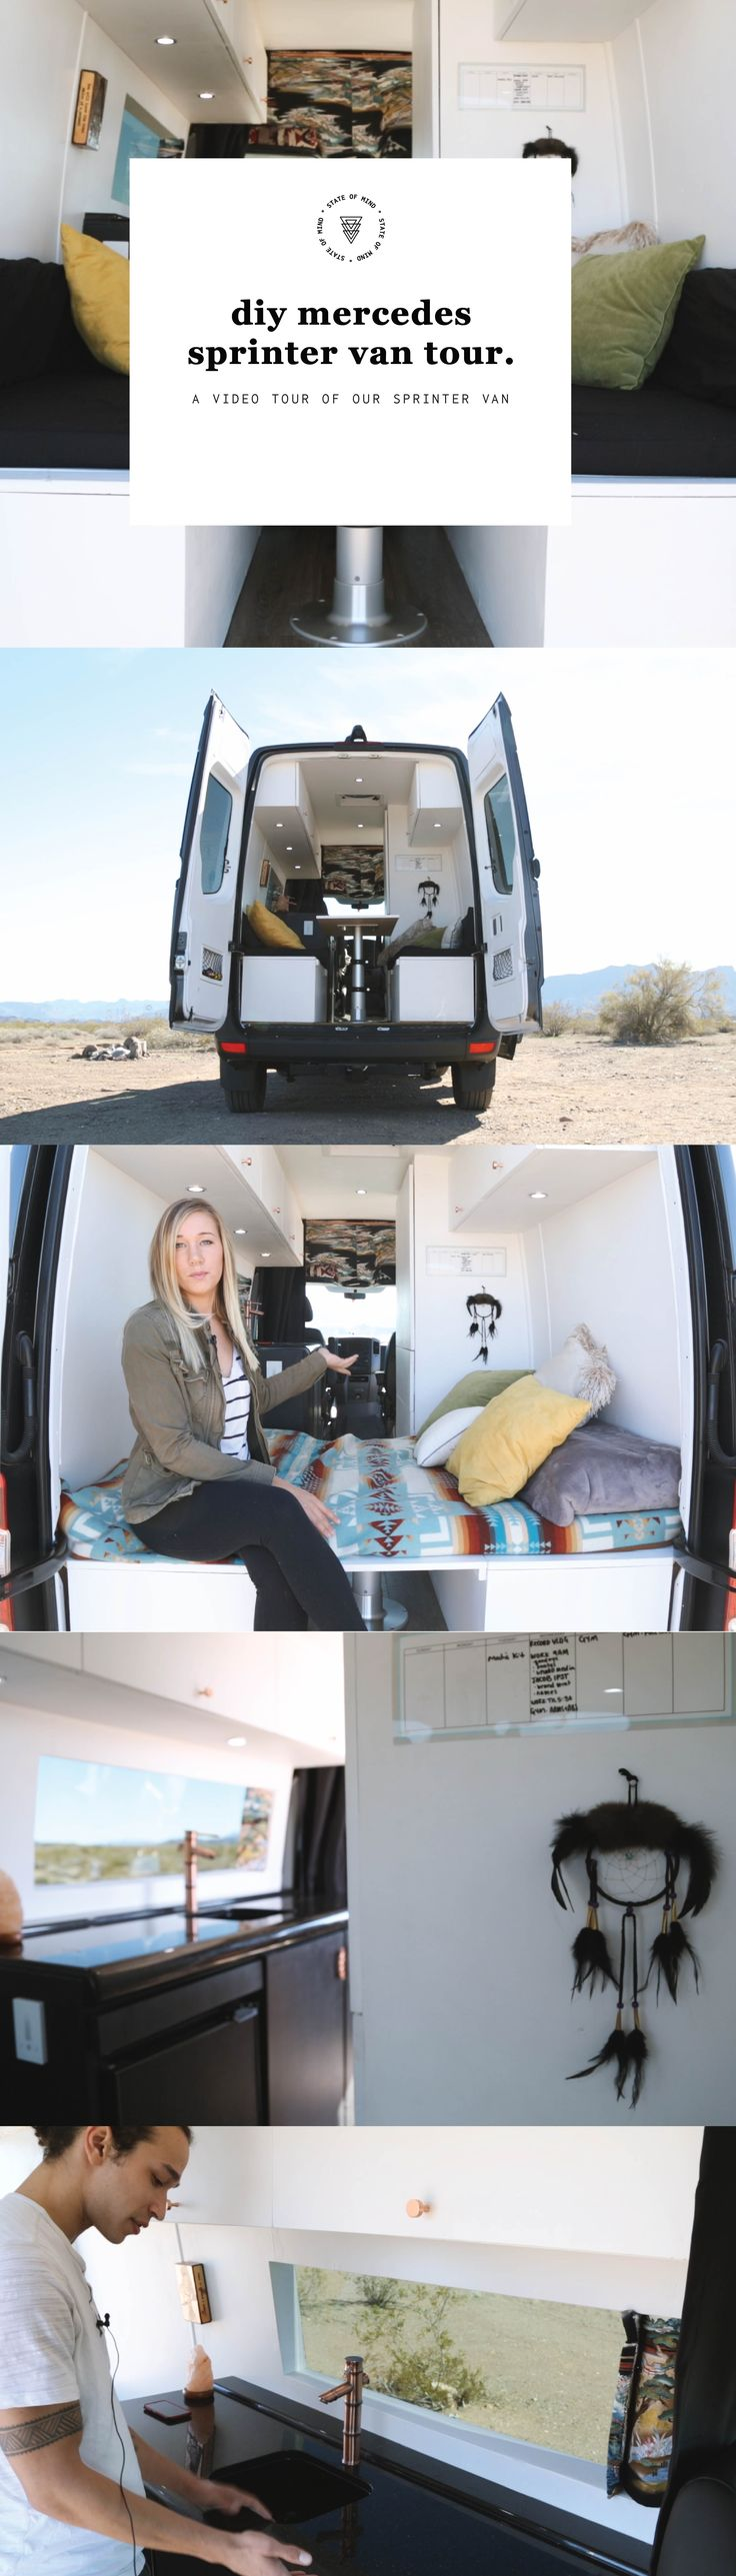 Van Life: Diy Mercedes Sprinter Van Conversion Tour.